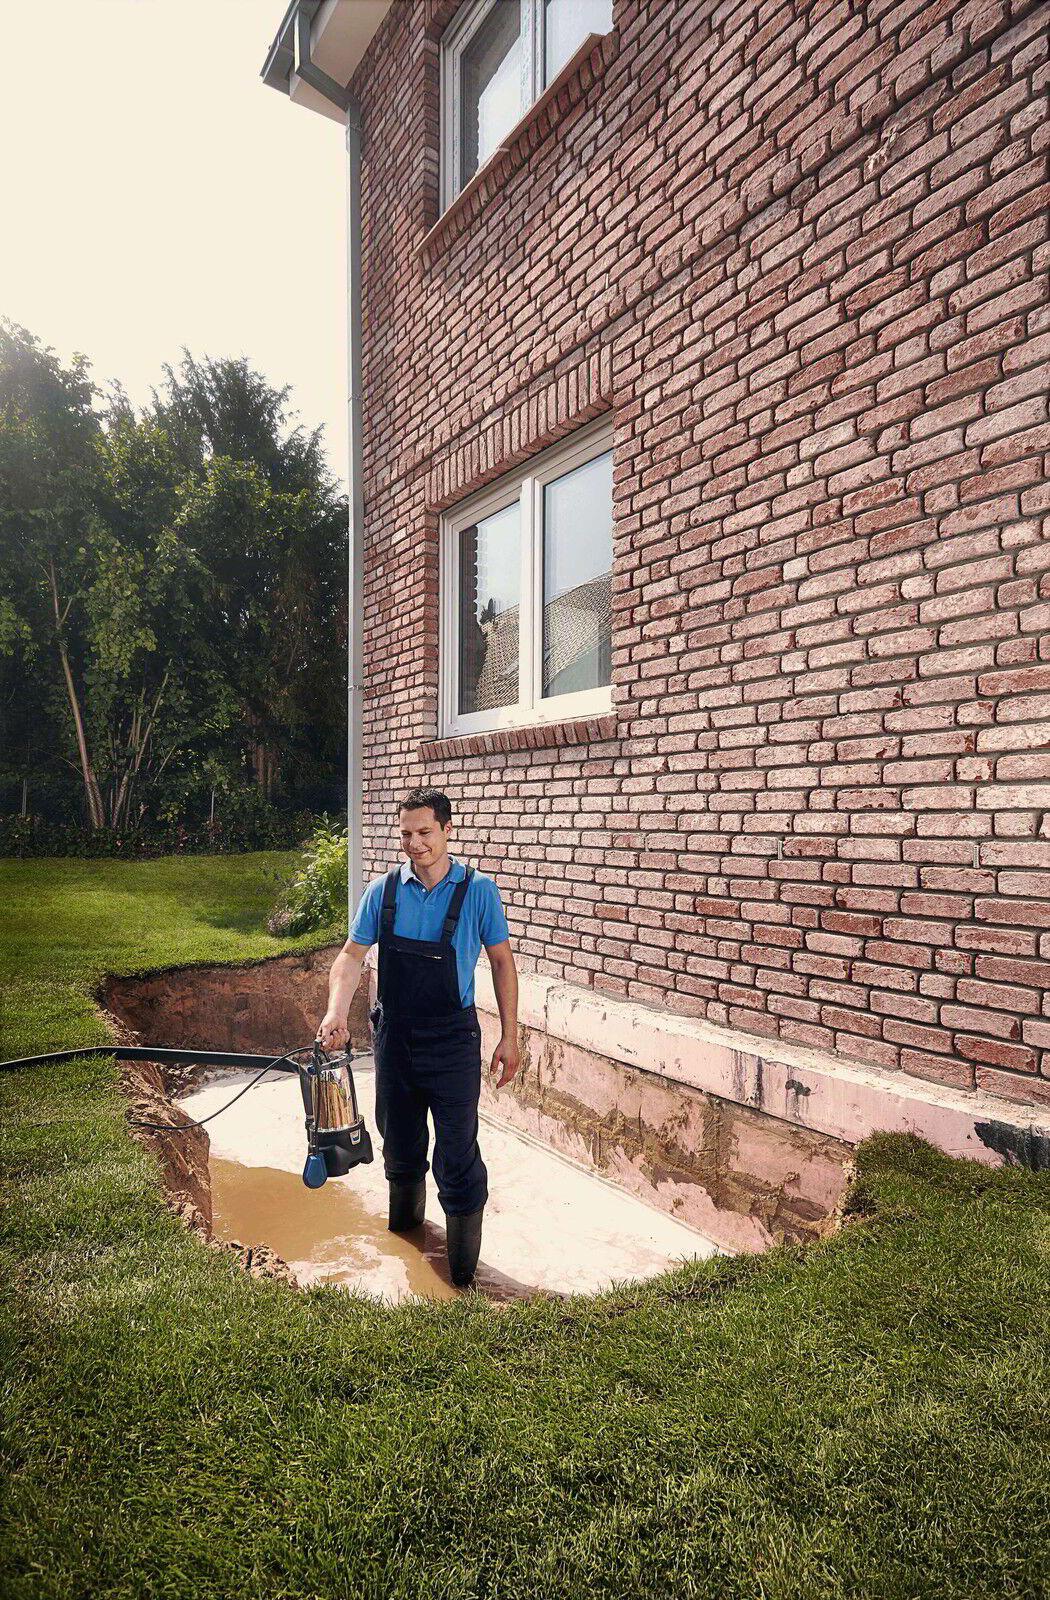 Oase Promax MudDrain 14000 Schmutzwassertpumpe Tauchpumpe Tauchpumpe Tauchpumpe  Brunnen und Zisterne d4d9fd